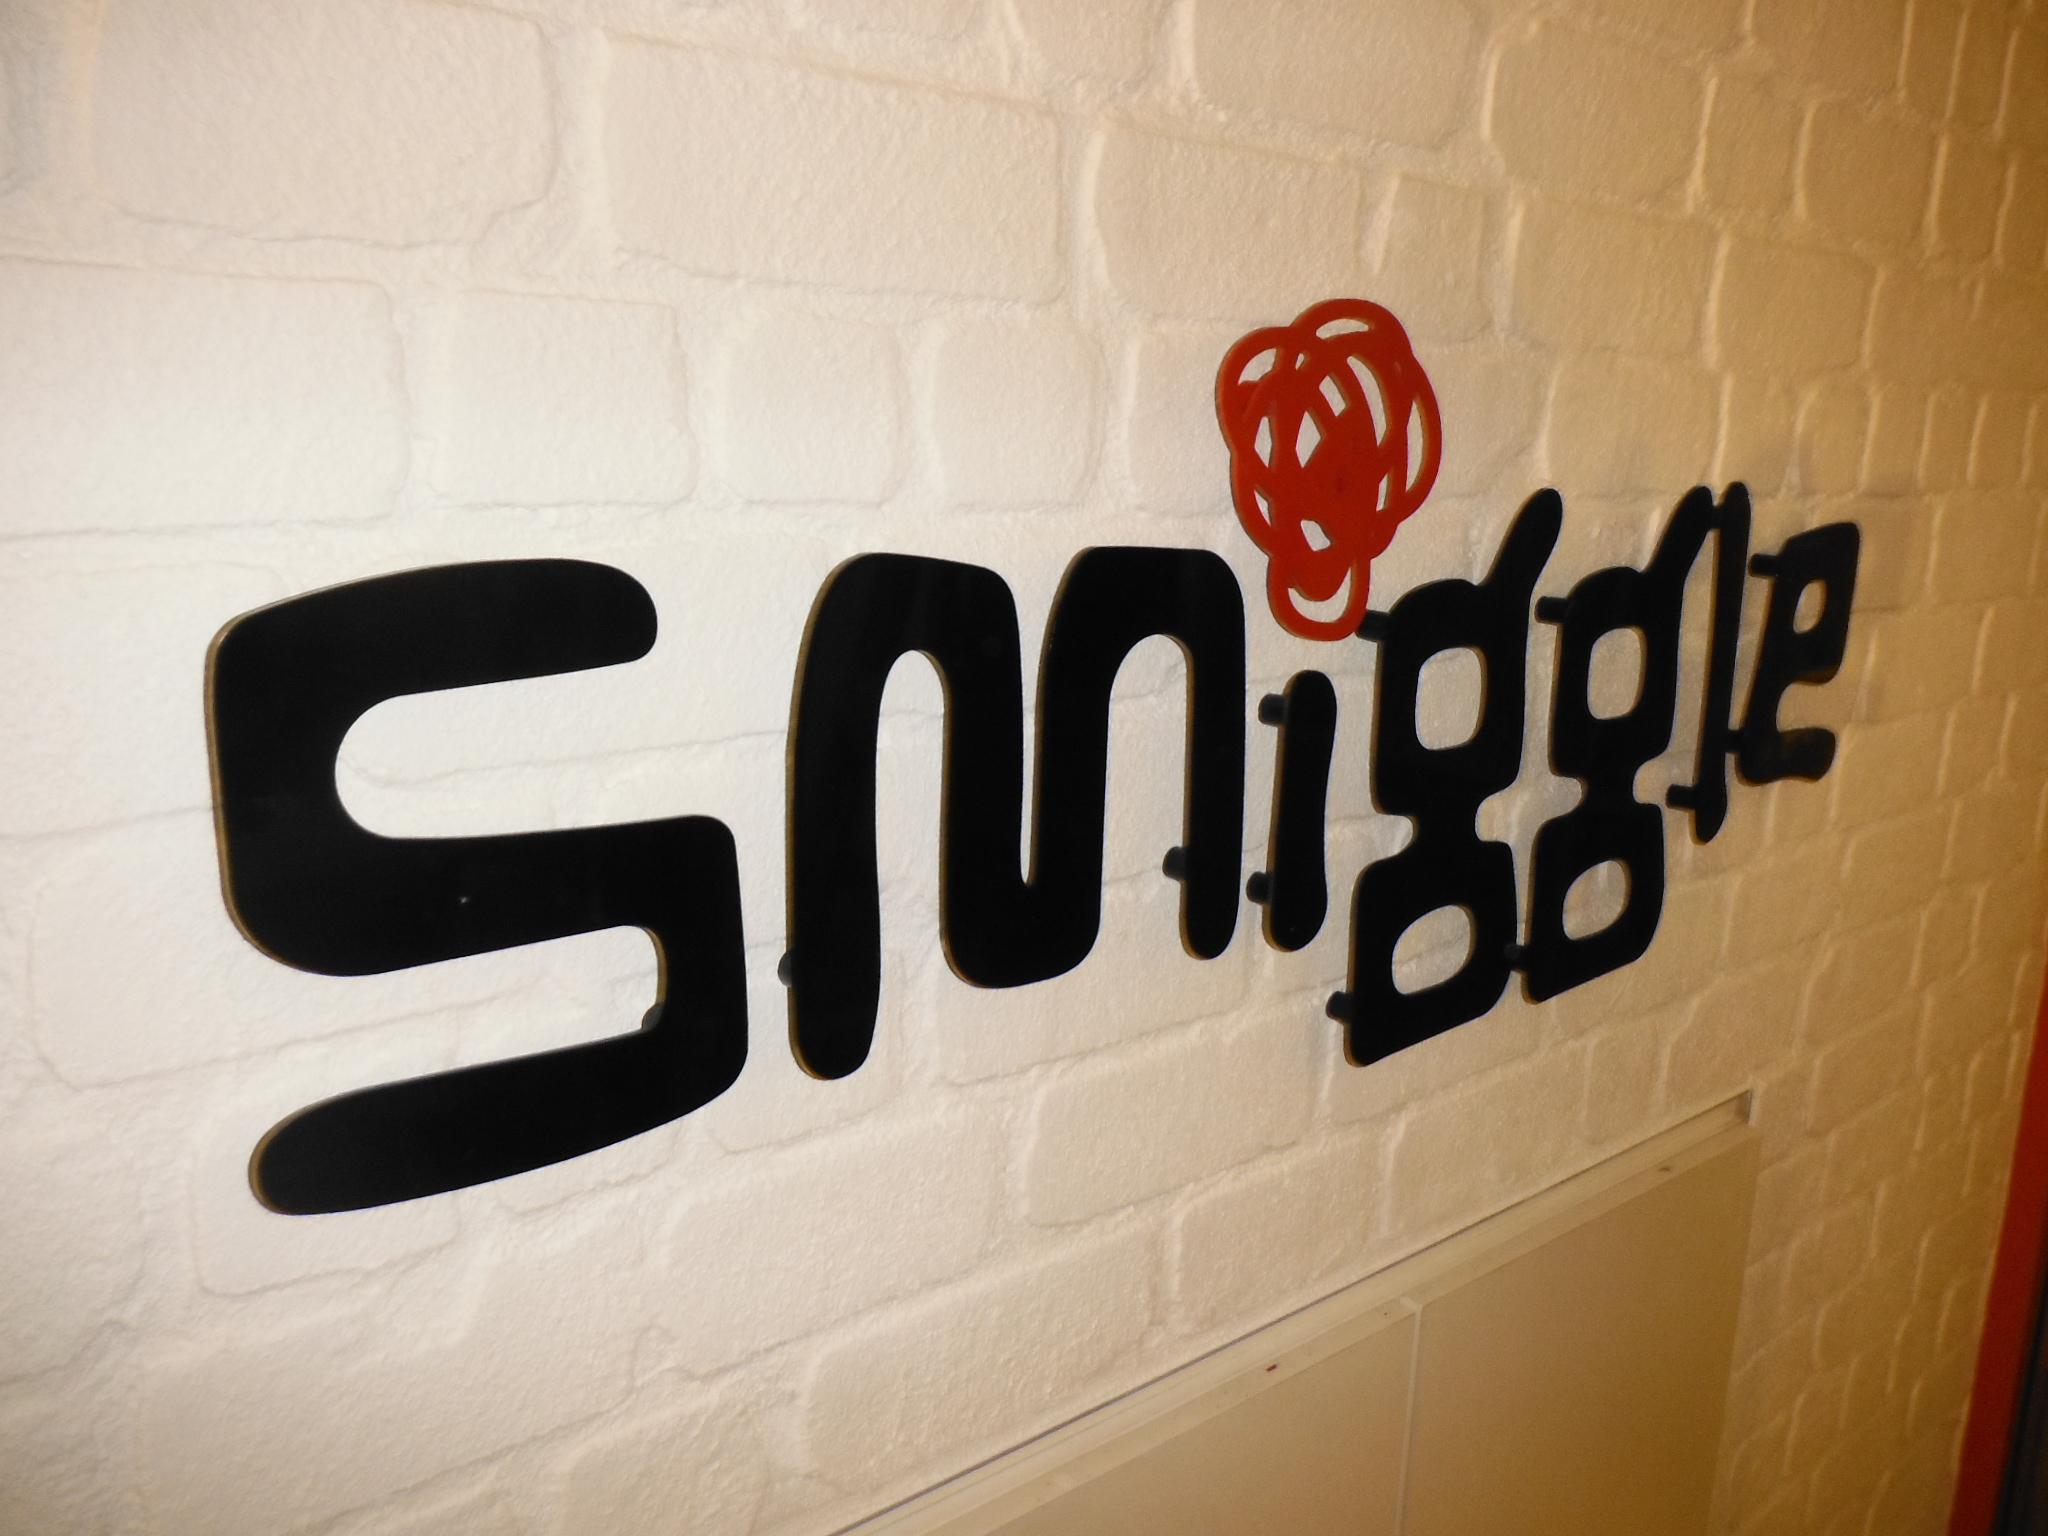 Smiggle installation by SignMax Bundaberg